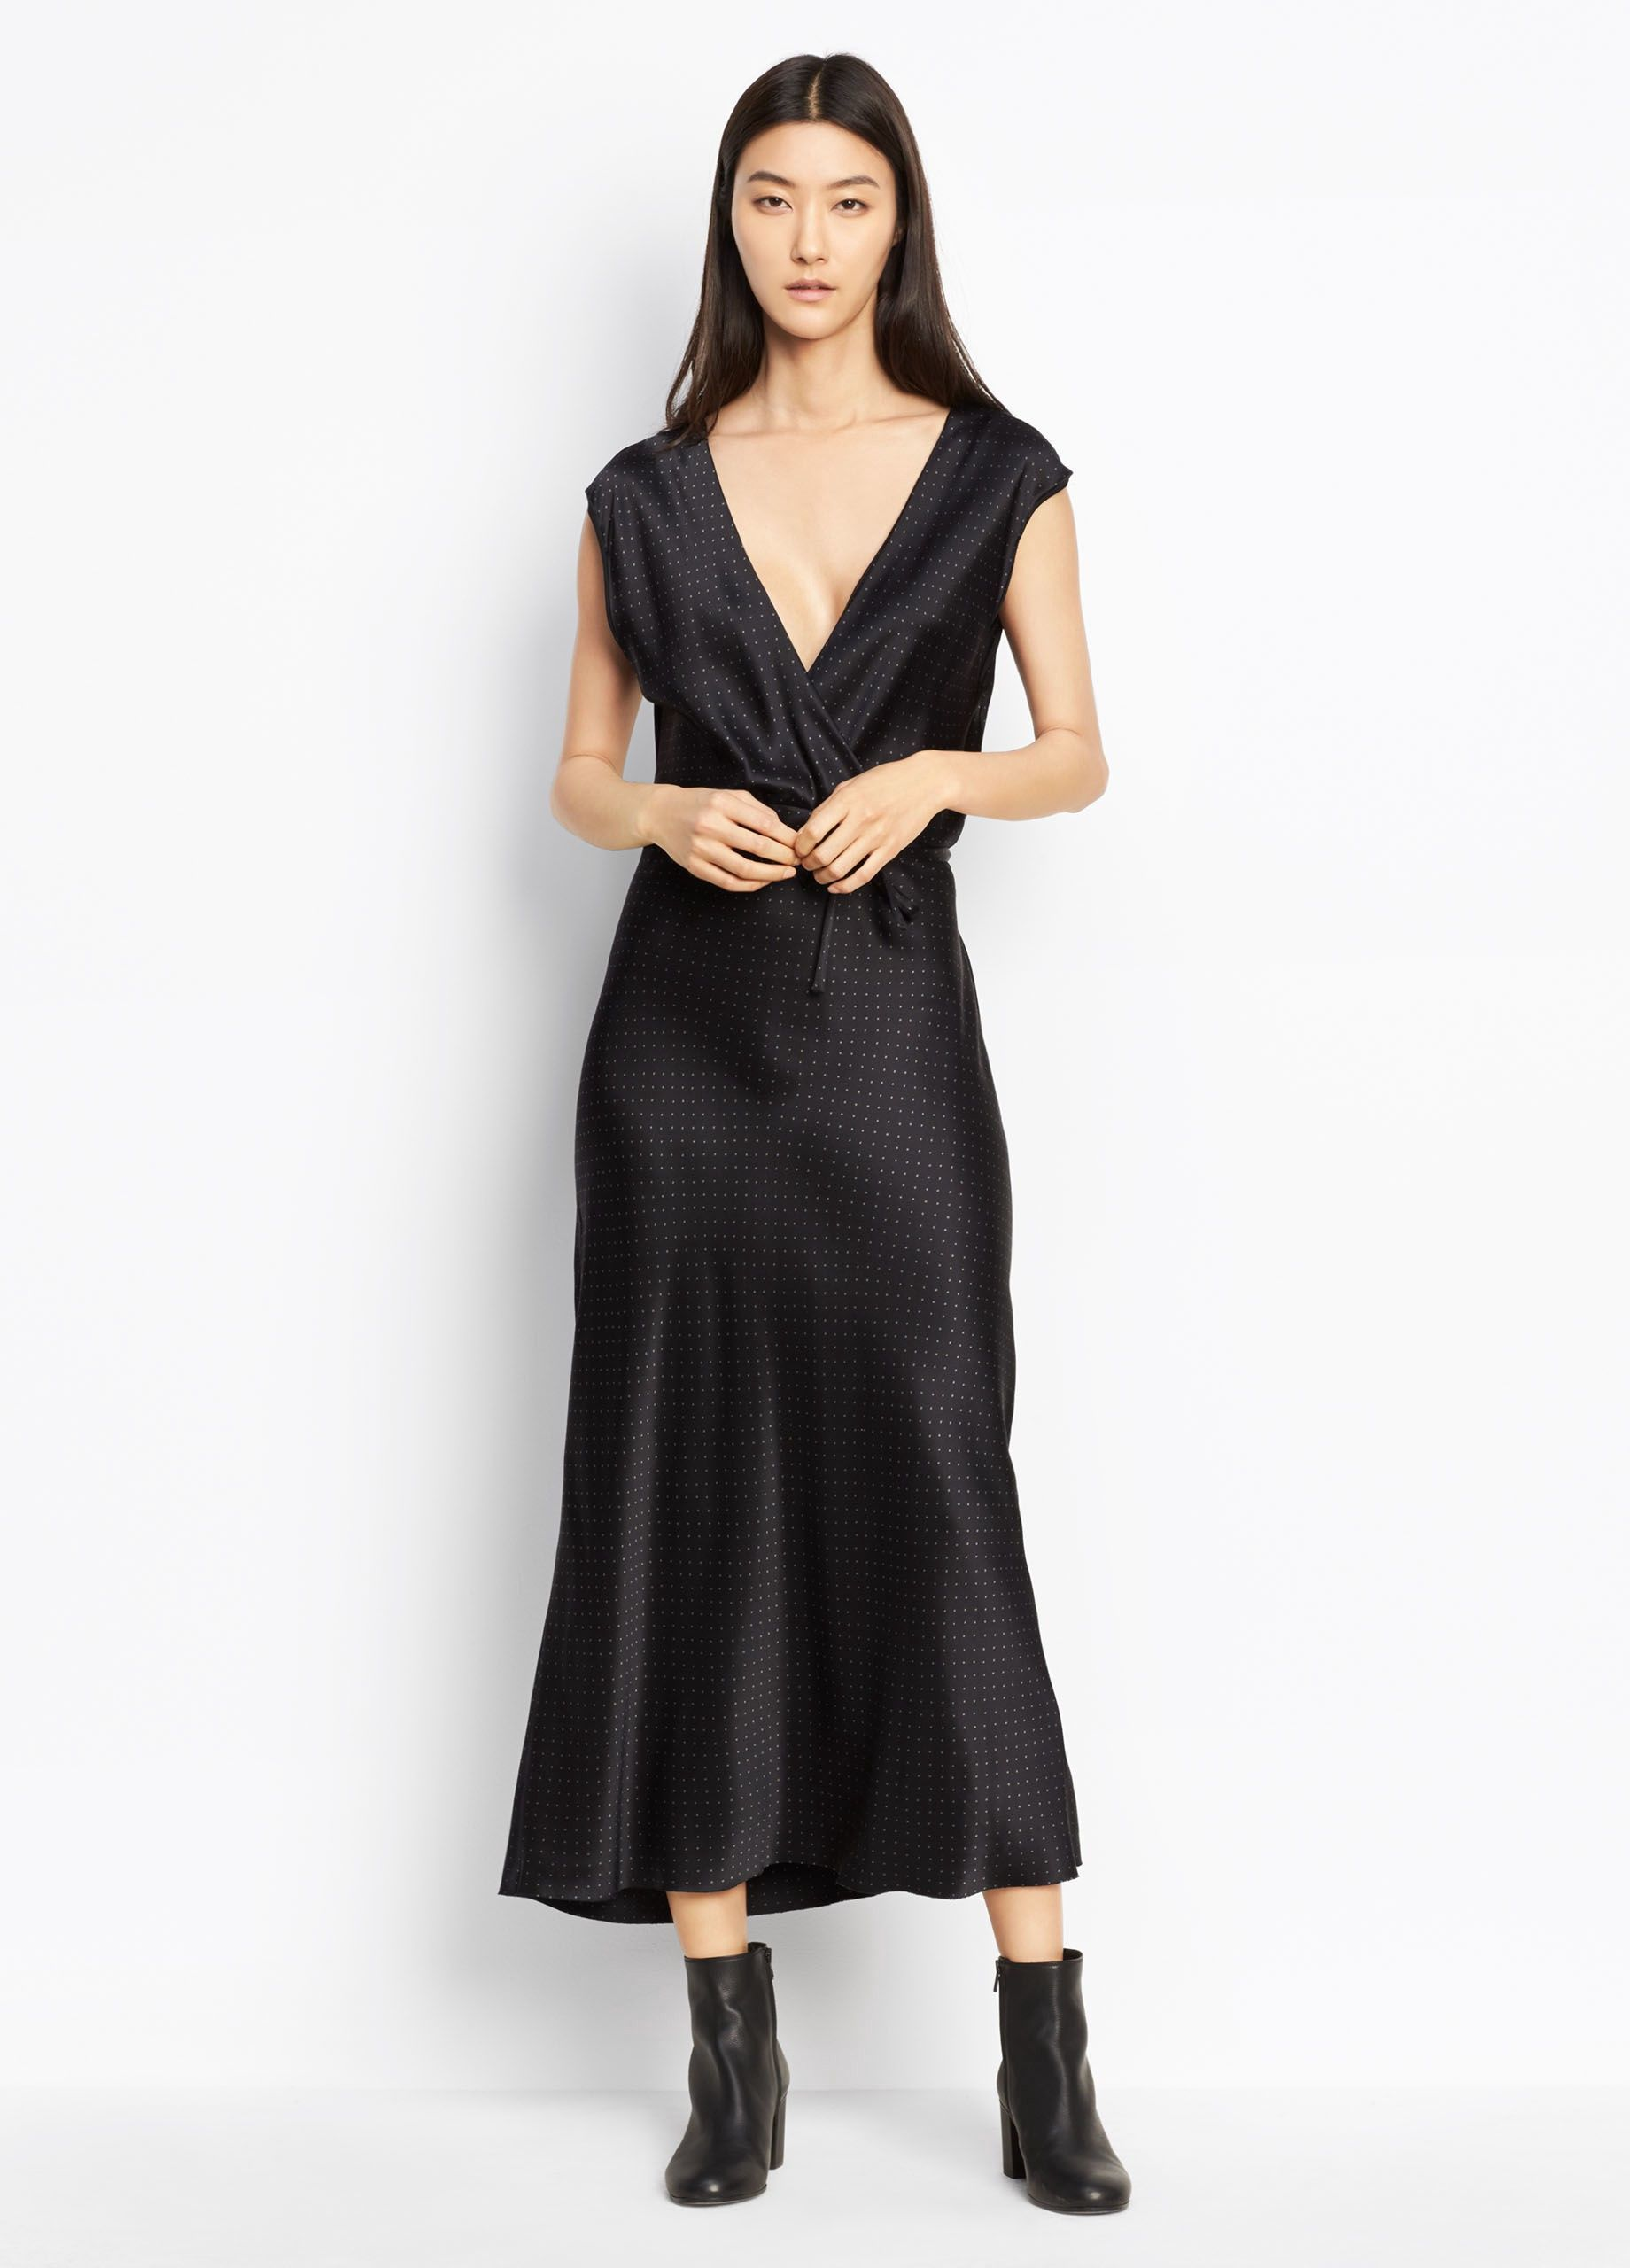 Vince Polka Dot Crossover Slip Dress Black Frog Vince Cloth Necklines For Dresses Long Dresses Casual Maxi Polka Dot Maxi Dresses [ 2560 x 1840 Pixel ]